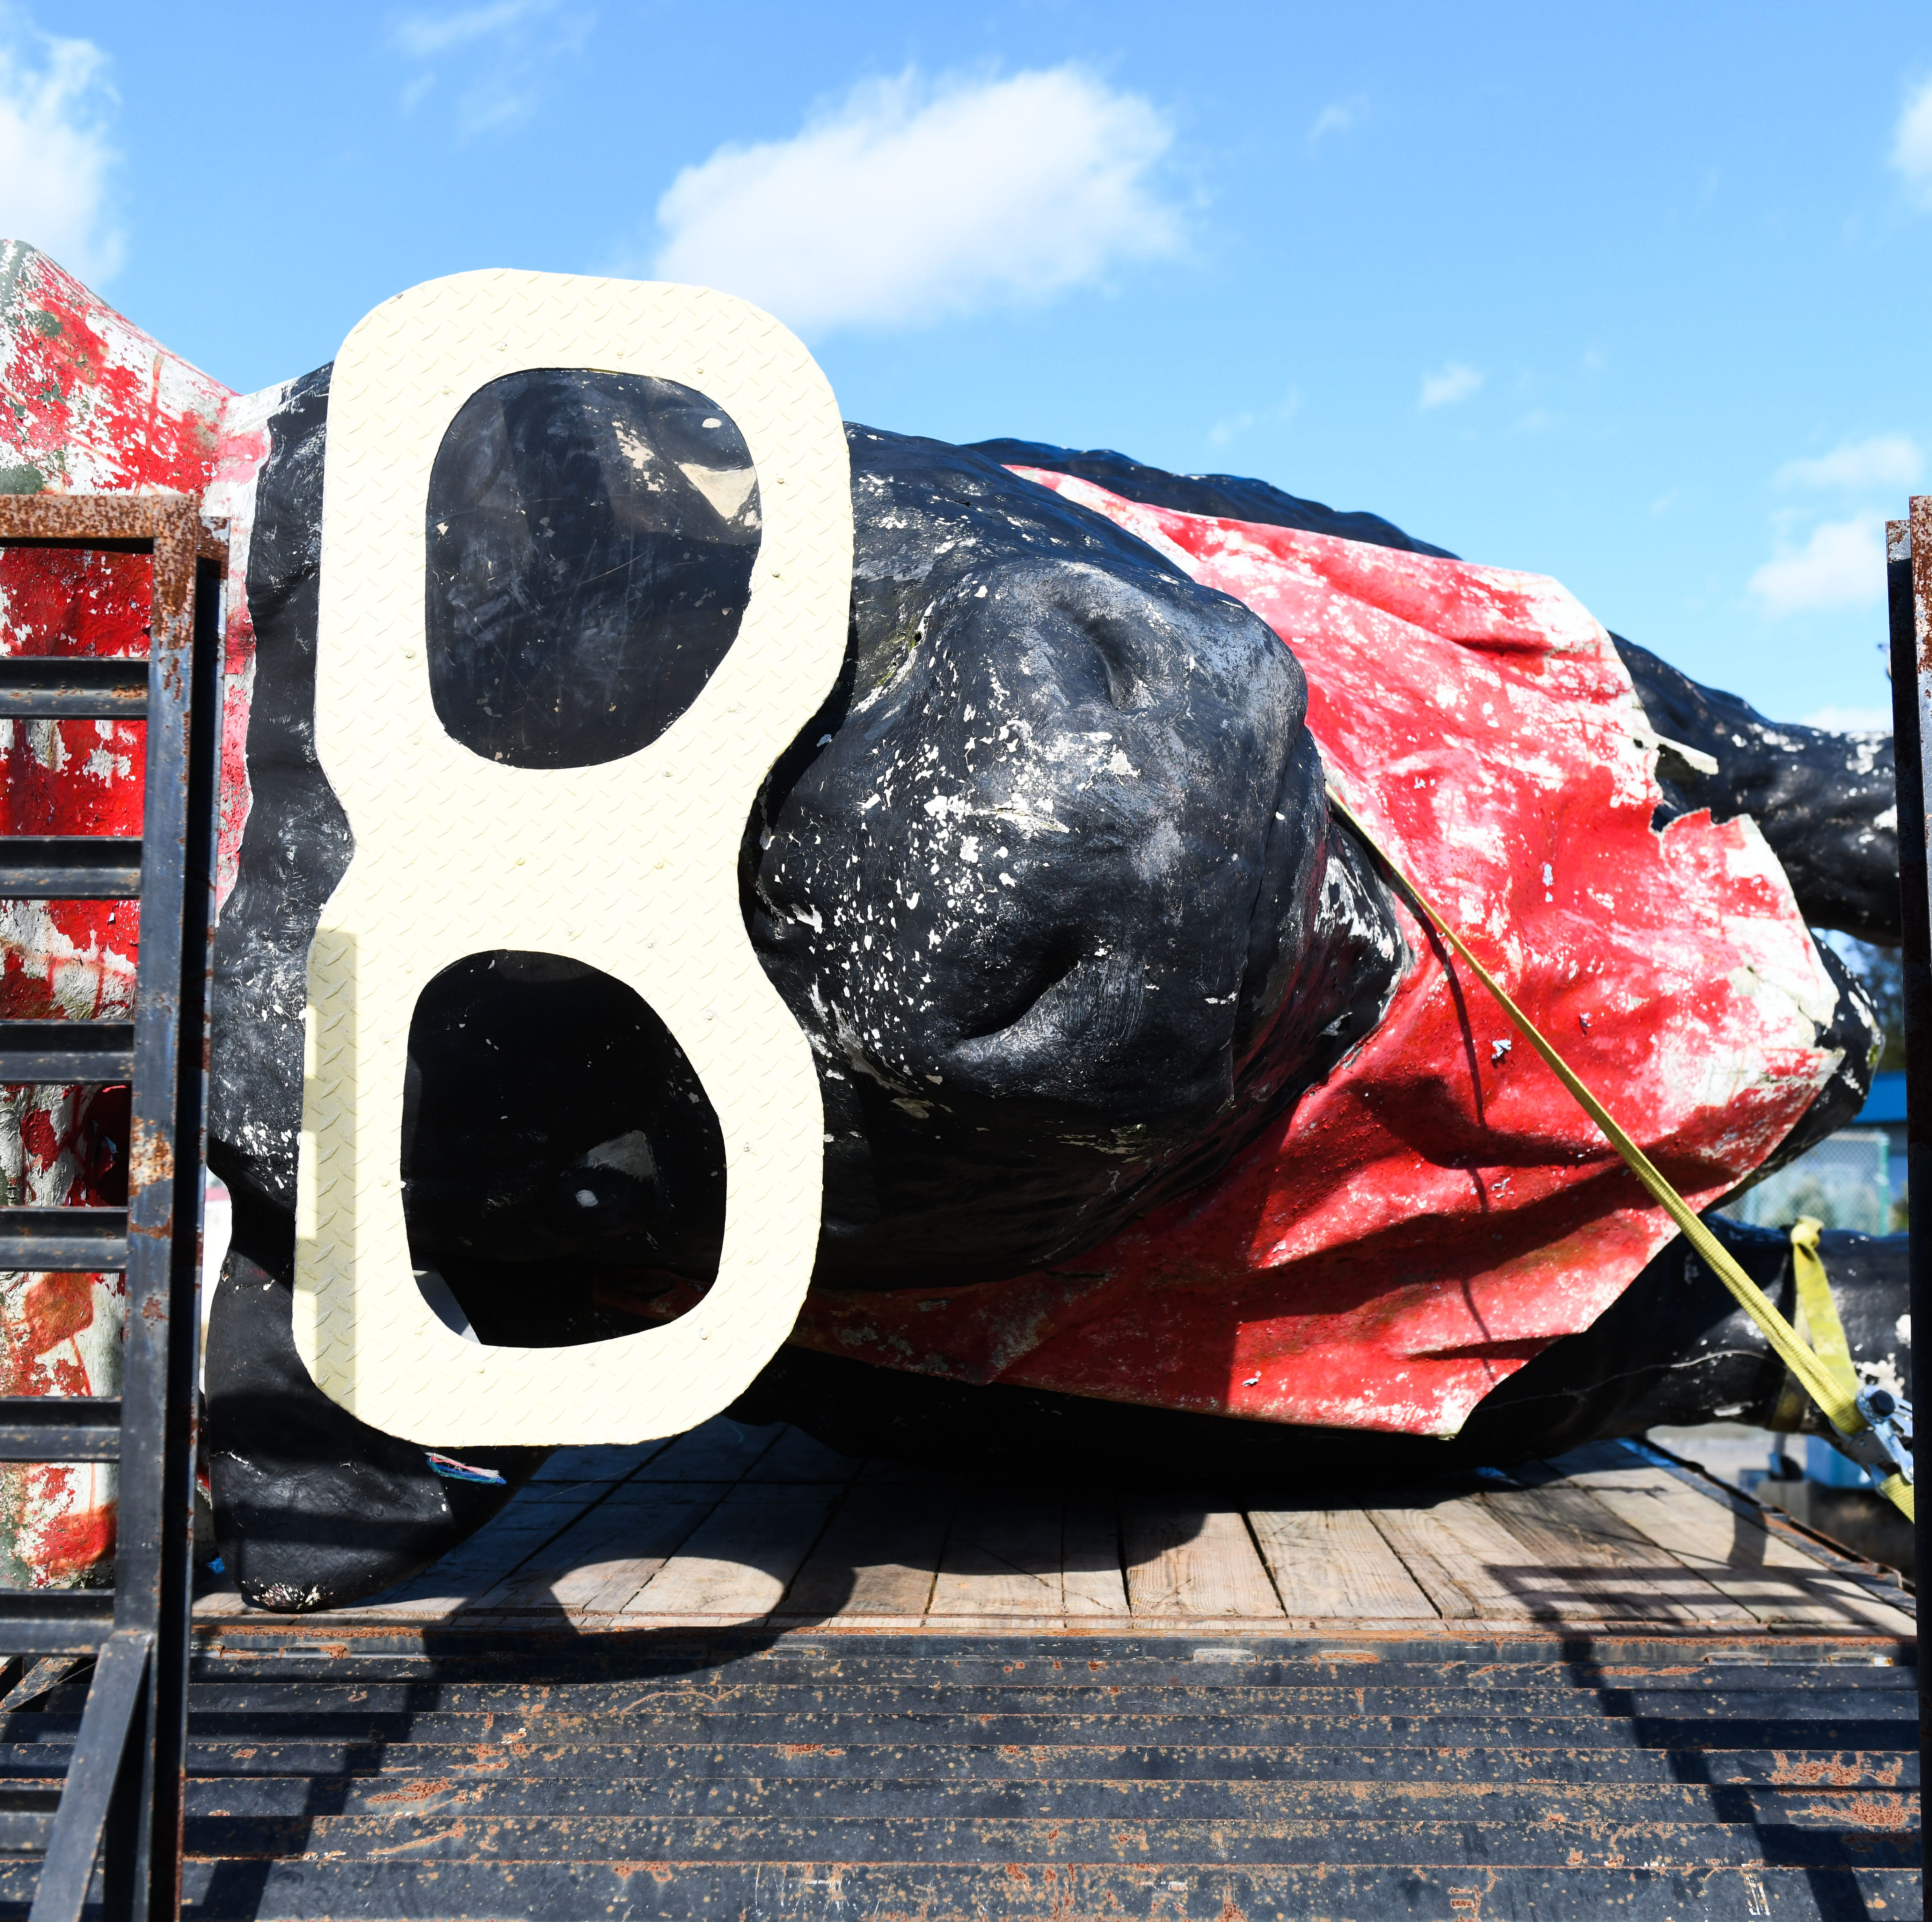 Capt. Bob's Bull: Ocean City's fiberglass statue gets new home in Sussex